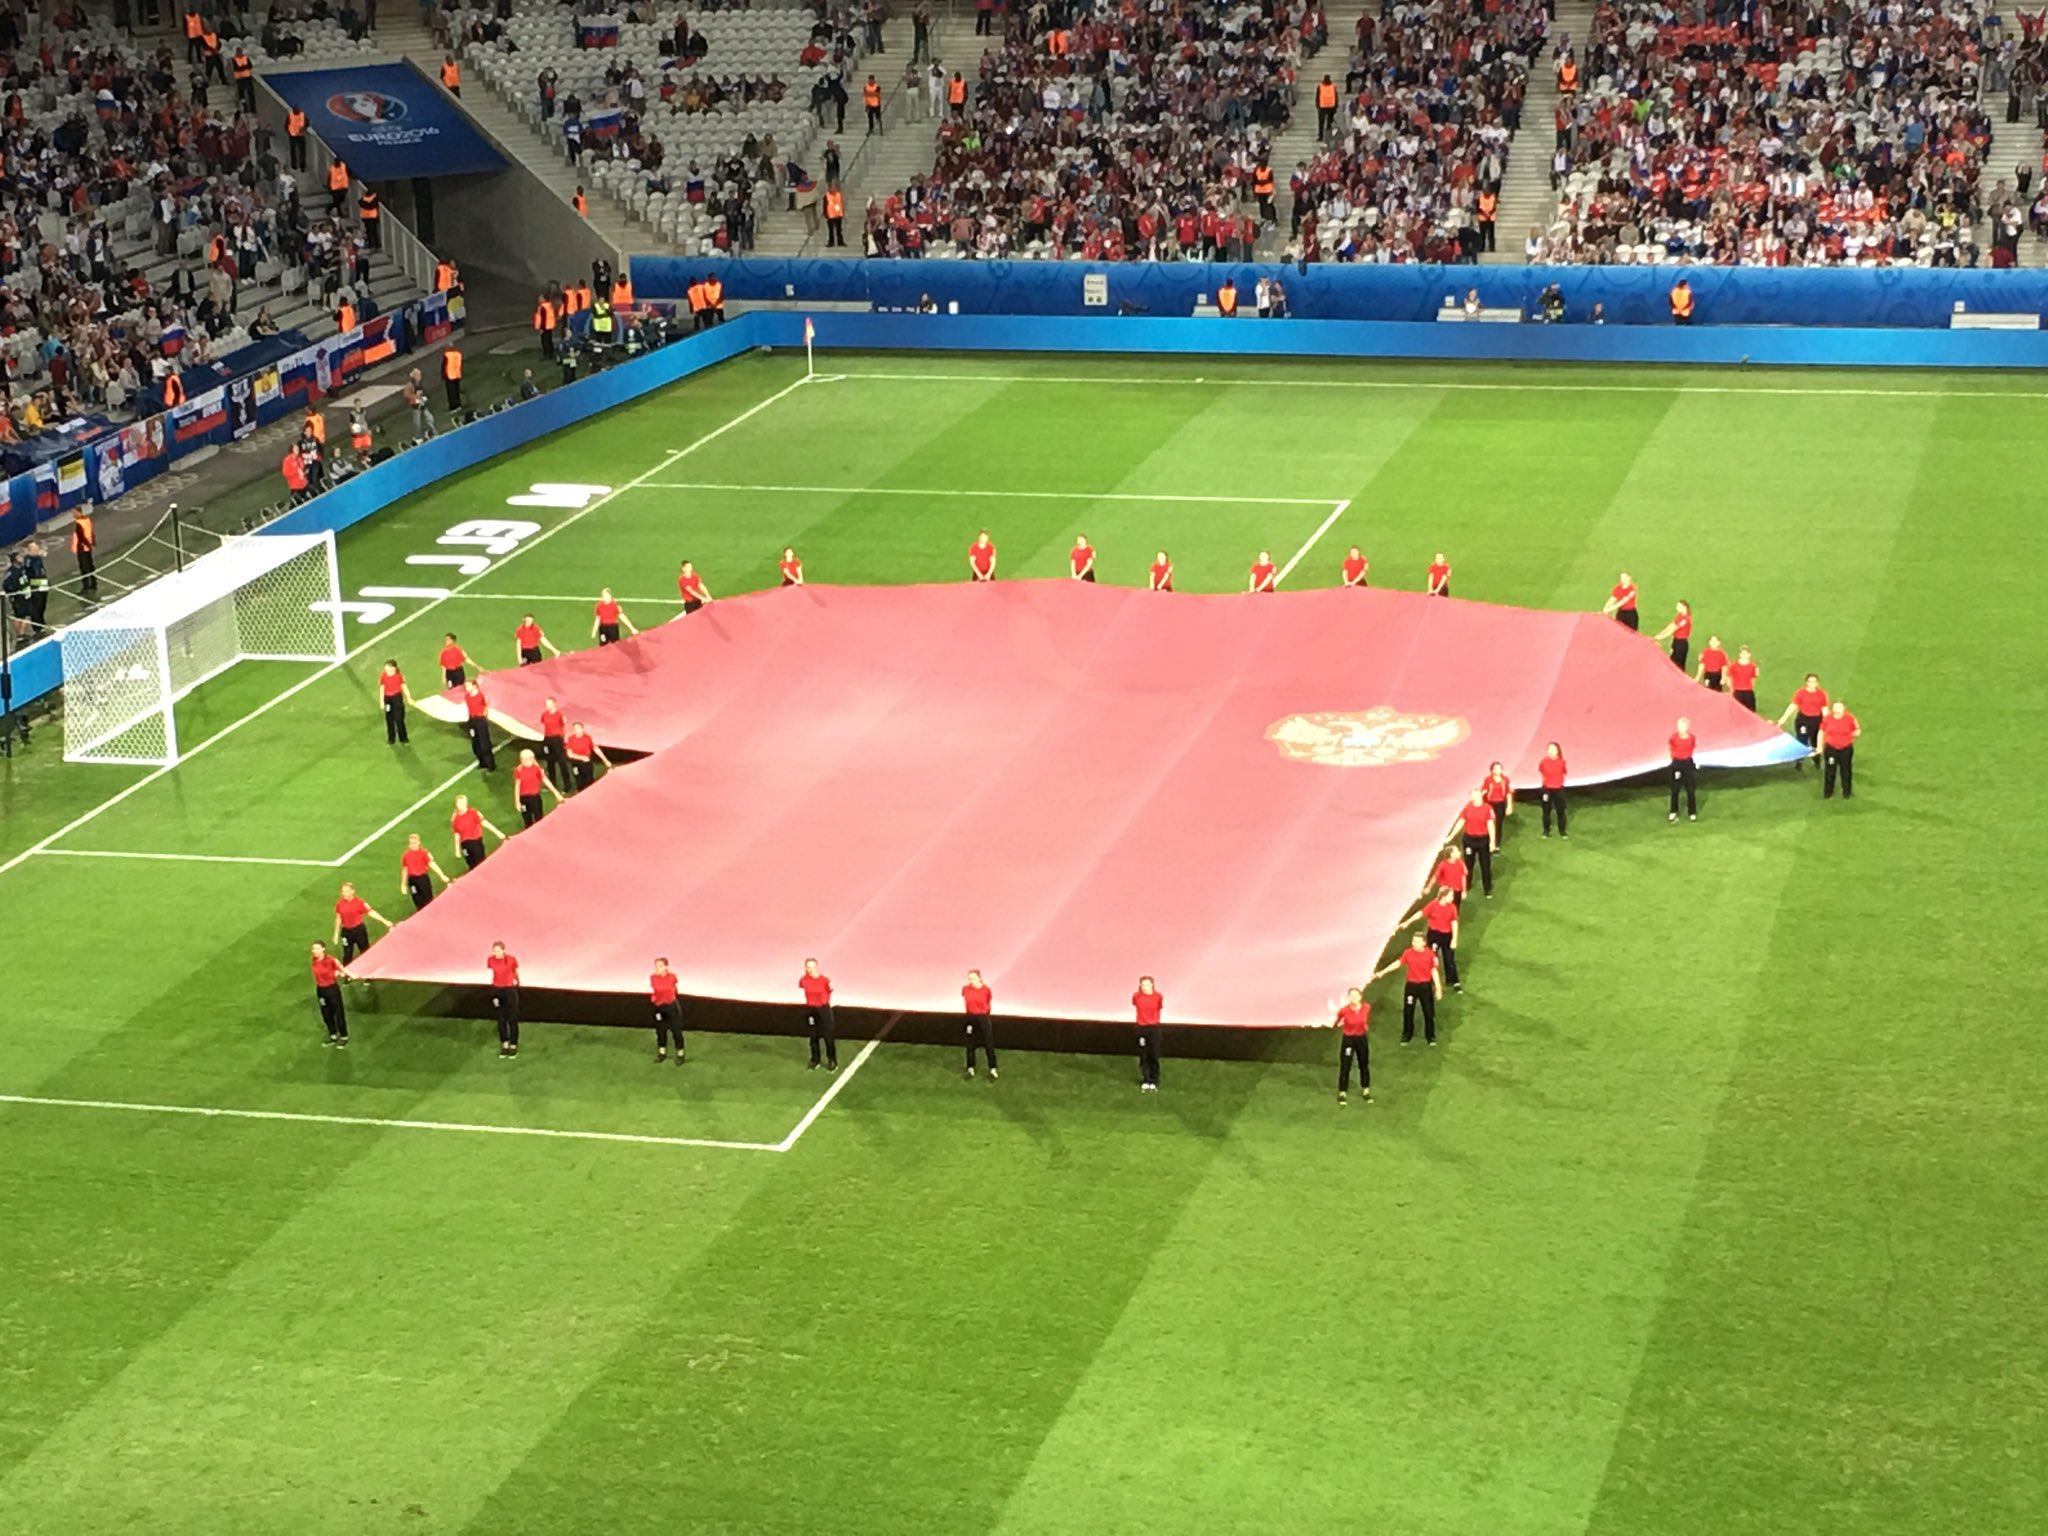 Чемпионат Европы по футболу 2016 - Страница 4 Ck_kAc2XIAAQ8yn